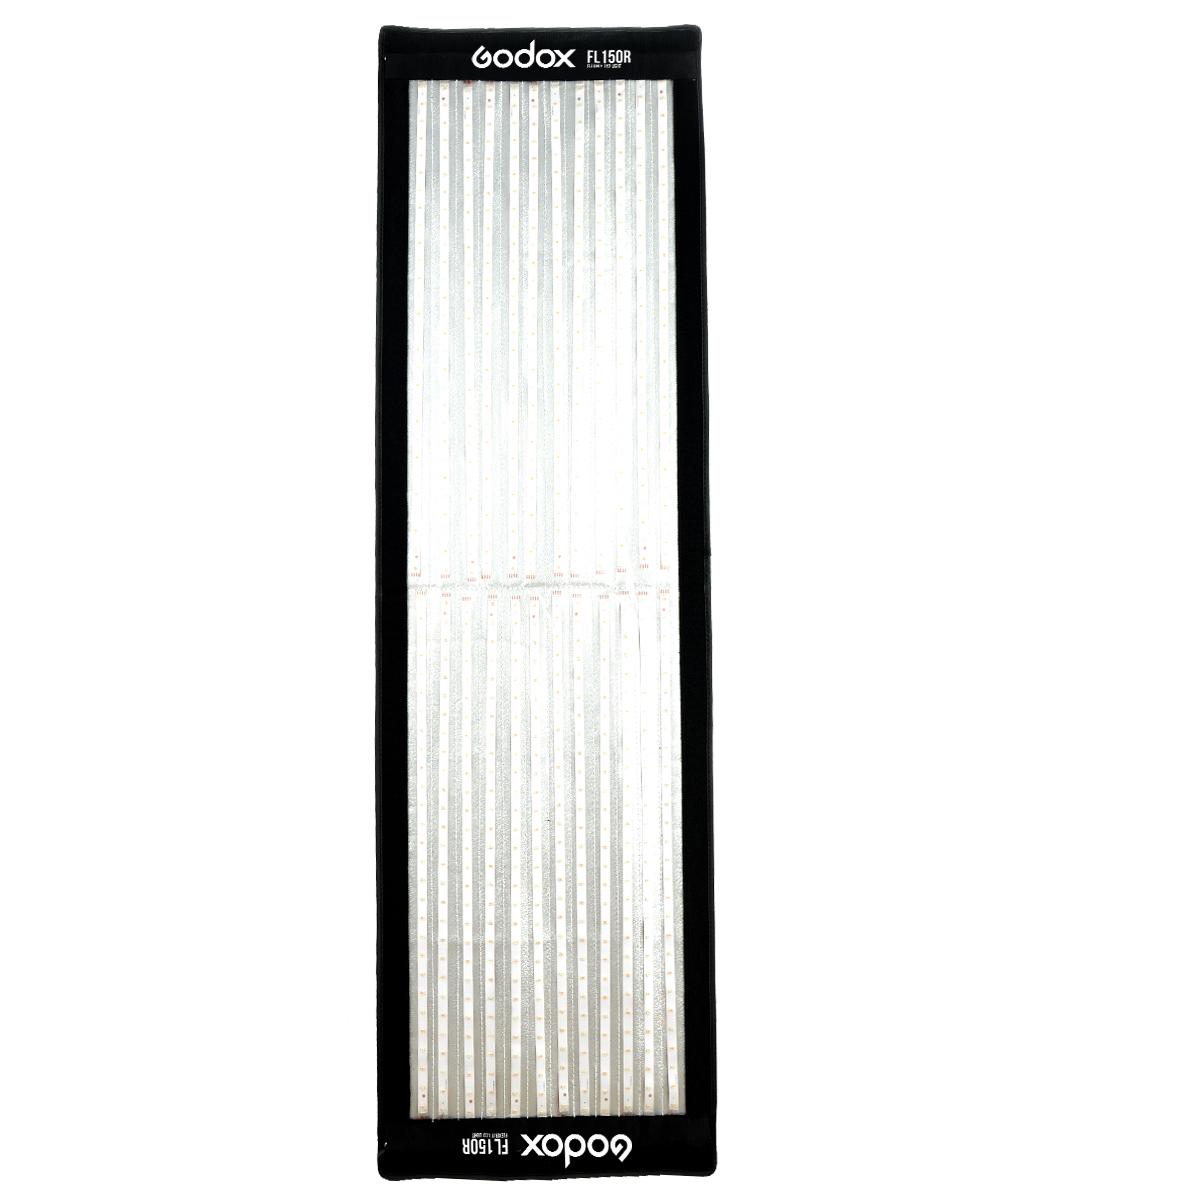 Godox FL 150 R 30 x 120 Flexible LED-Leuchte